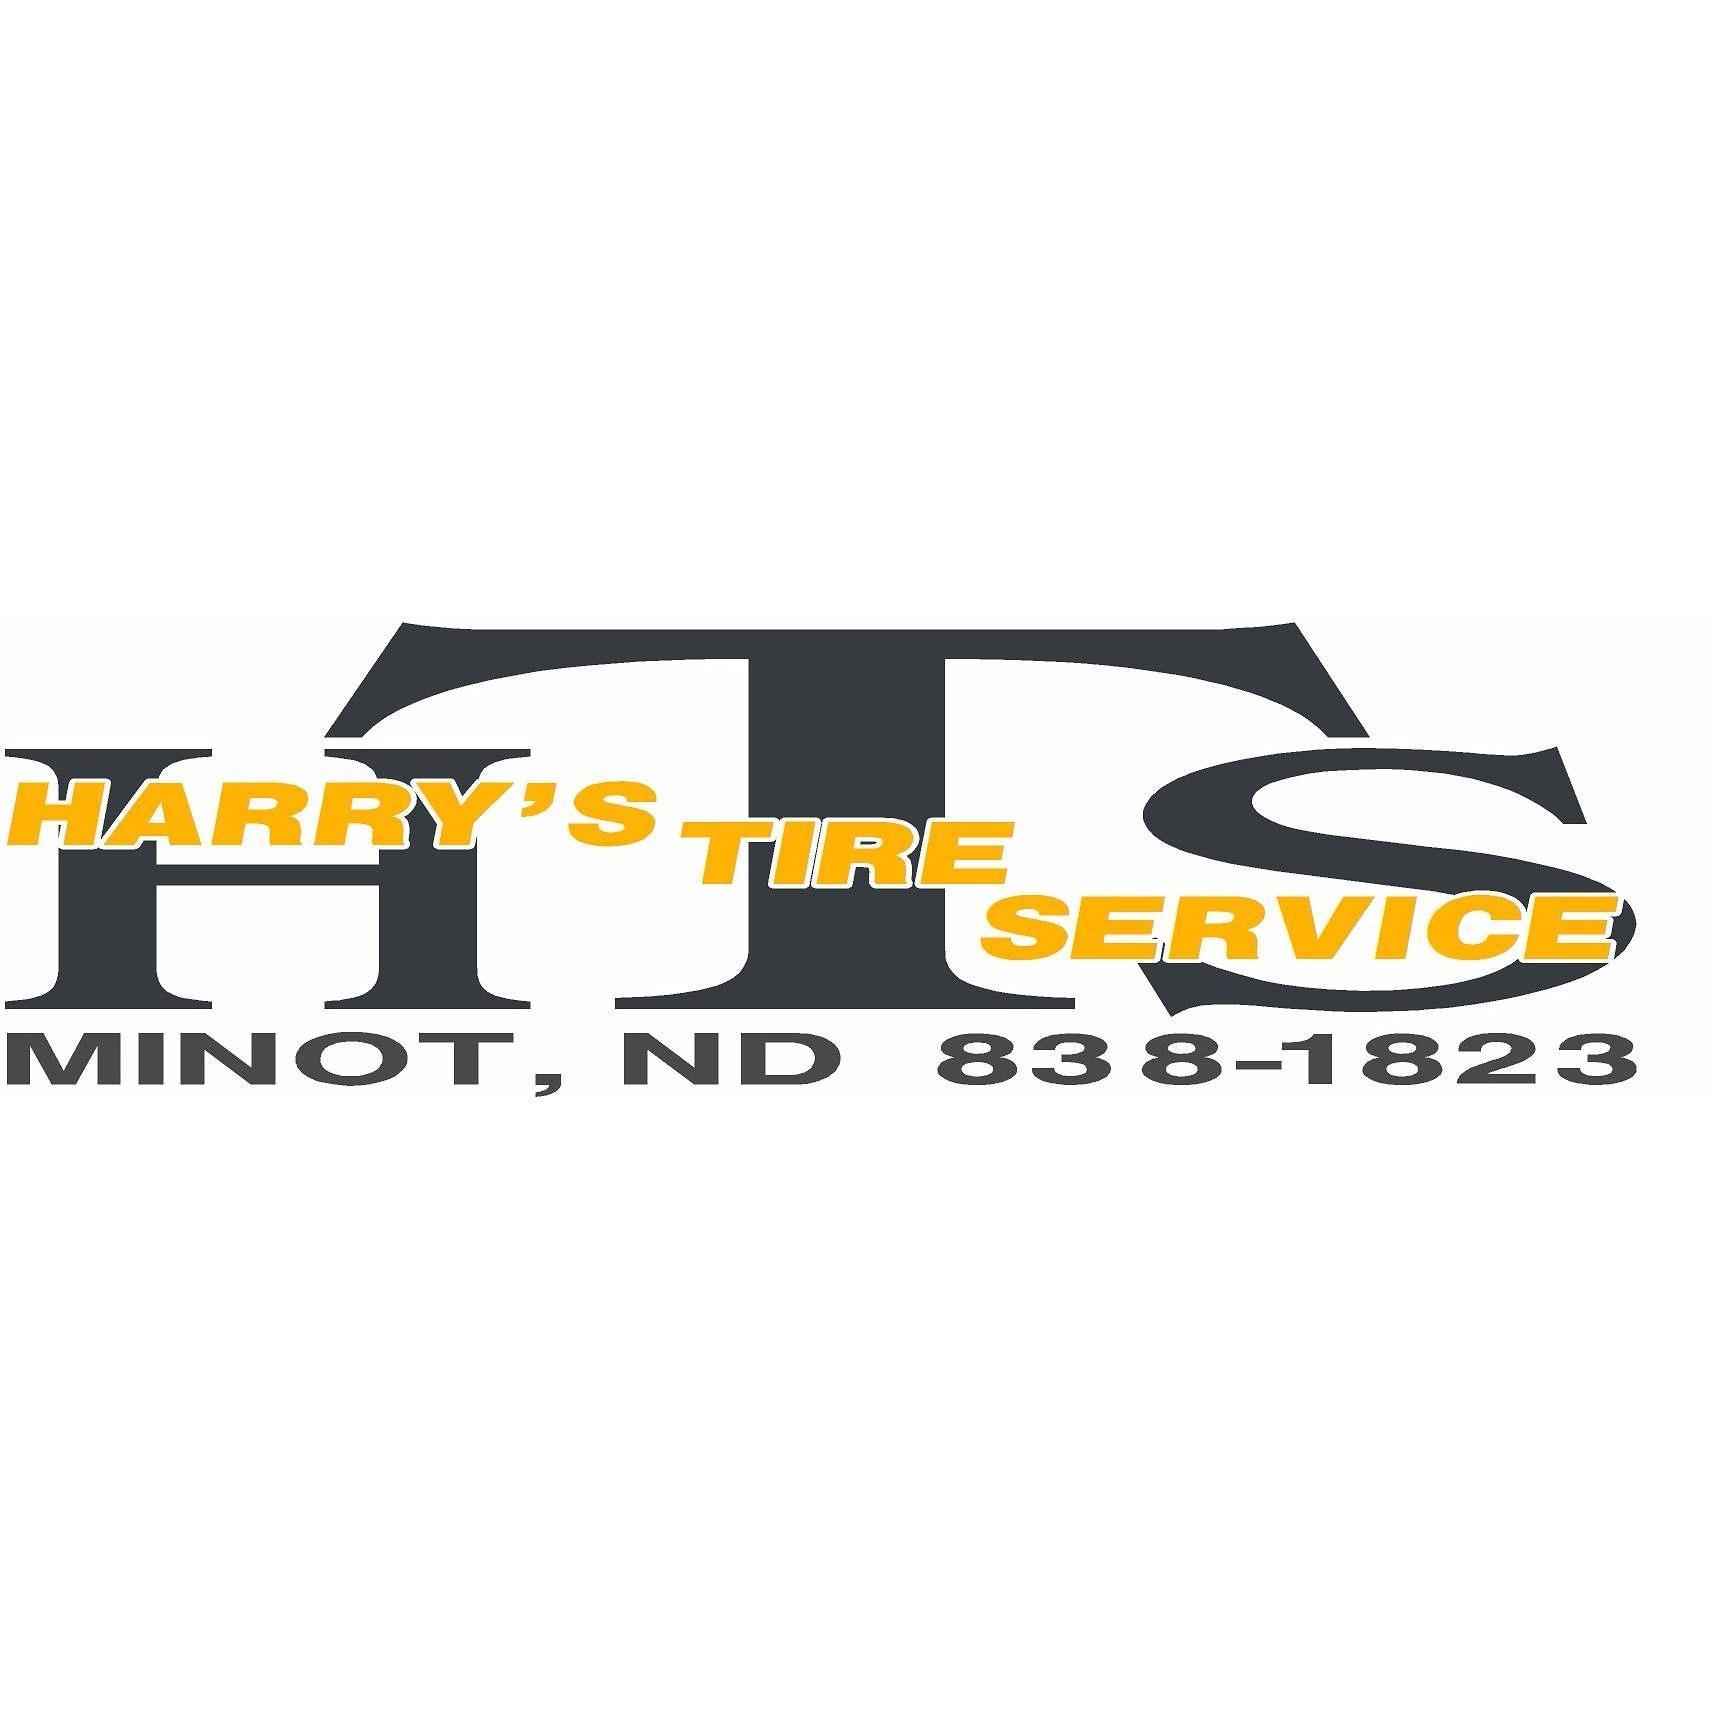 Harrys Tire Service Minot North Dakota Nd